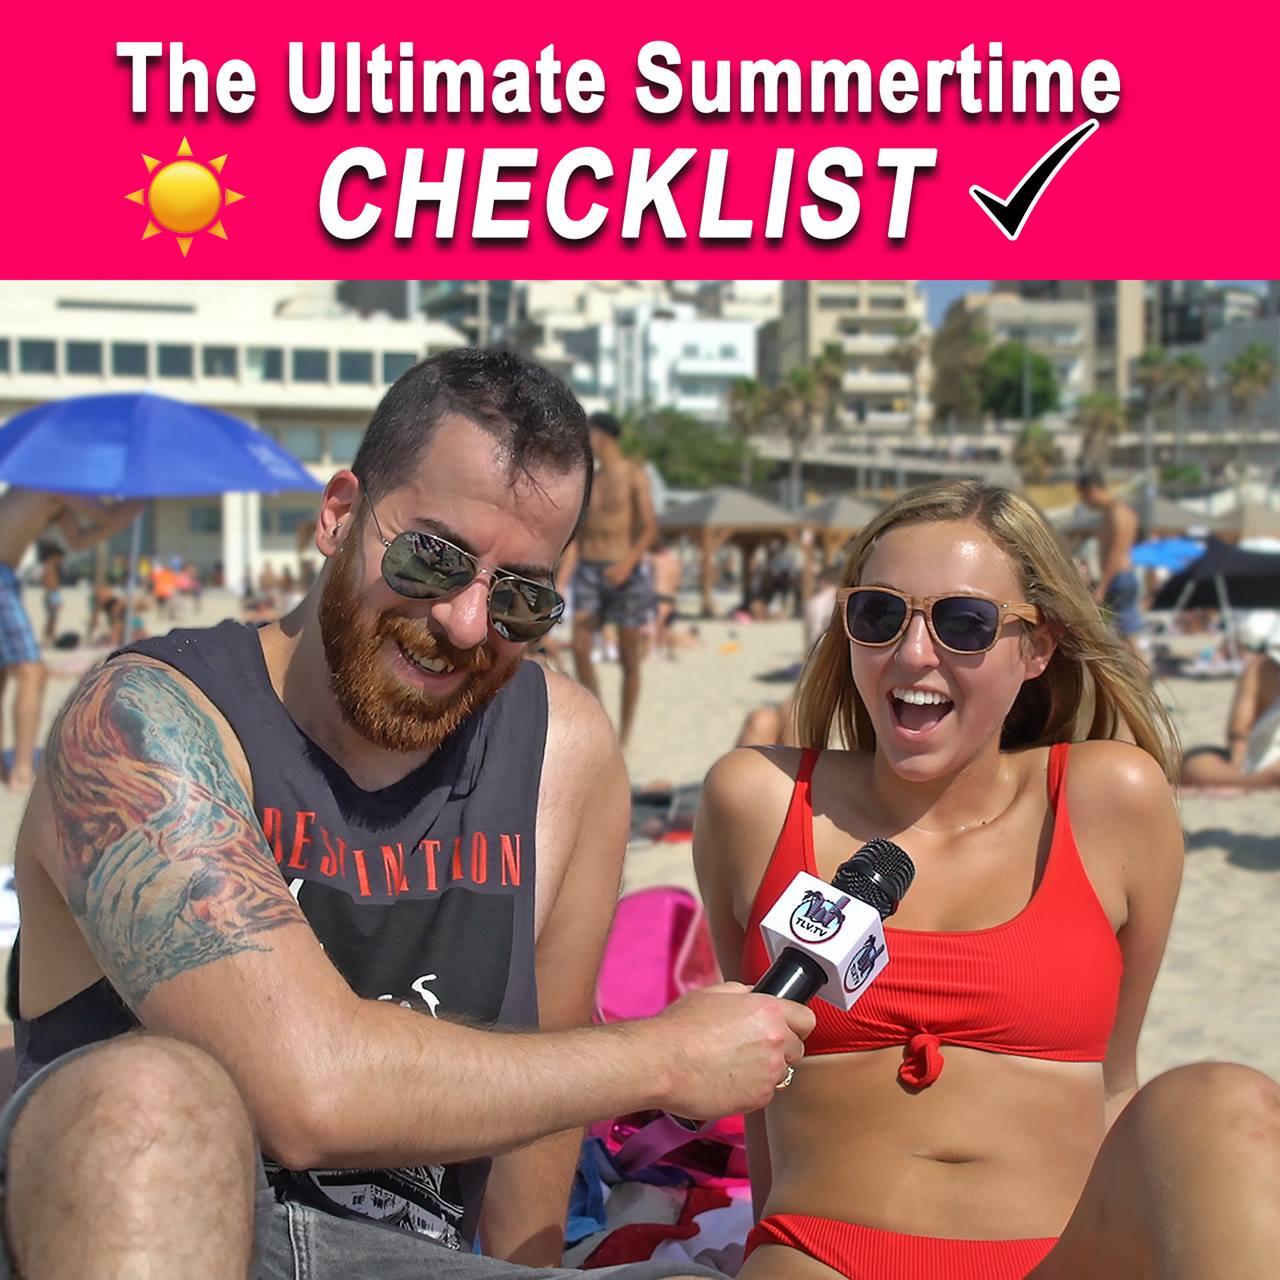 The Ultimate Summertime CHECKLIST - by Random Tel-Avivians!